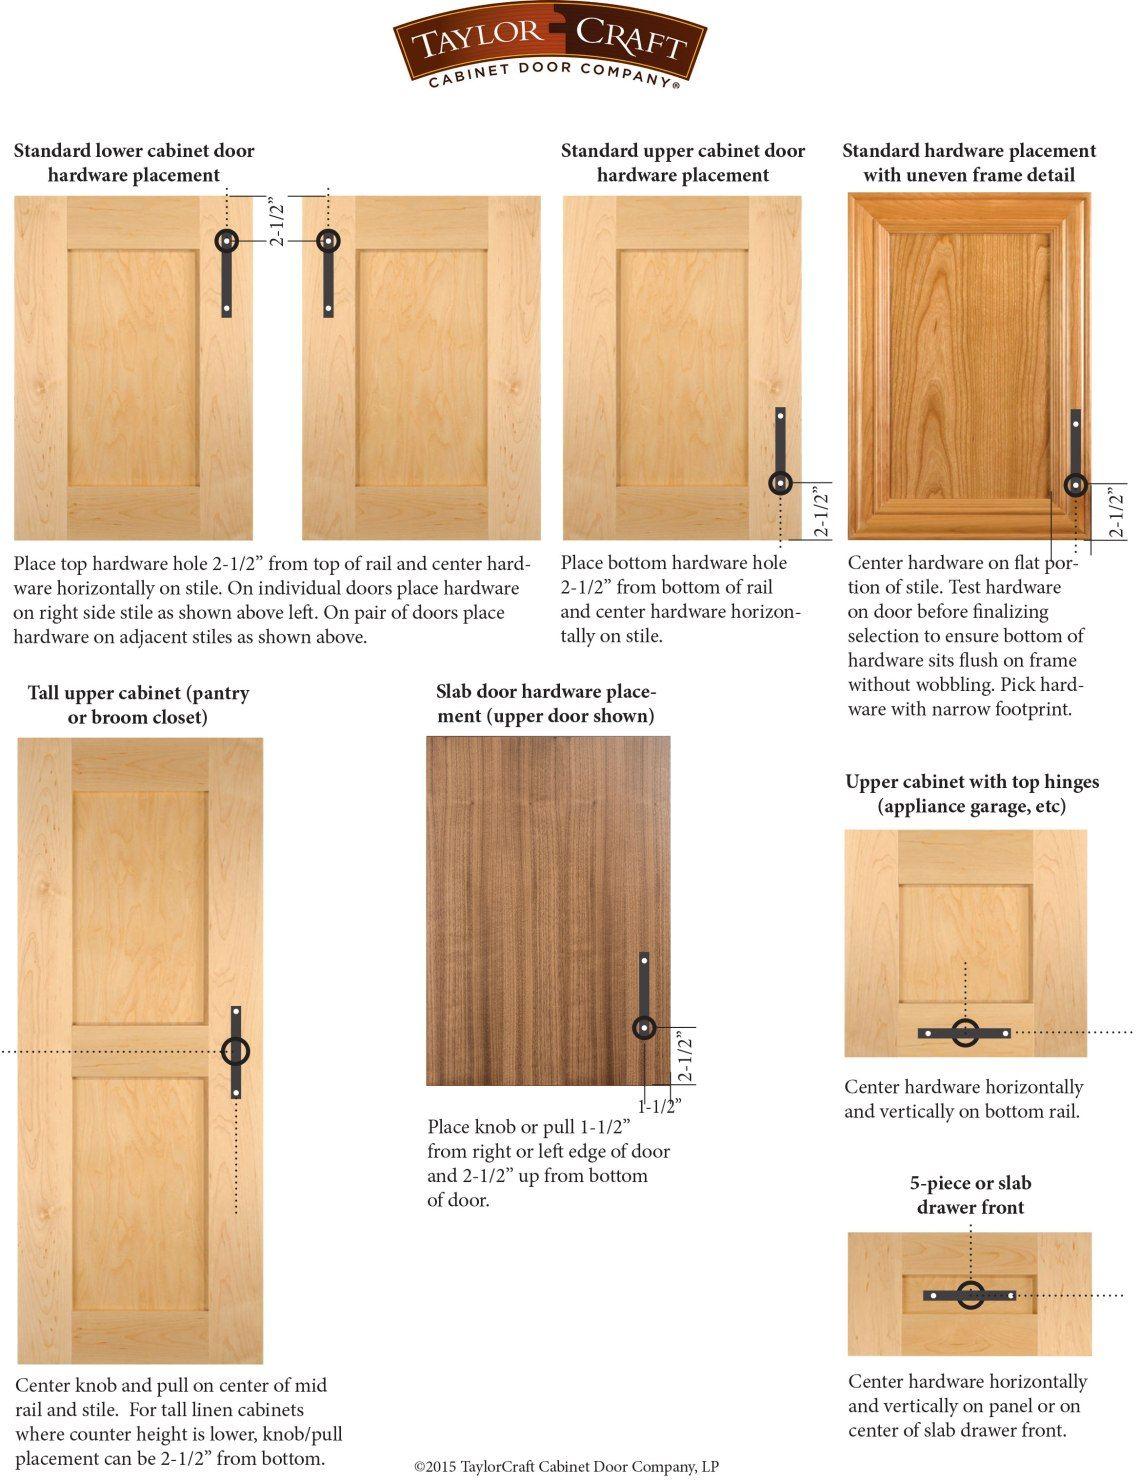 Kitchen Cabinet Installation Tools In 2020 Installing Cabinets Kitchen Cabinets Cabinet